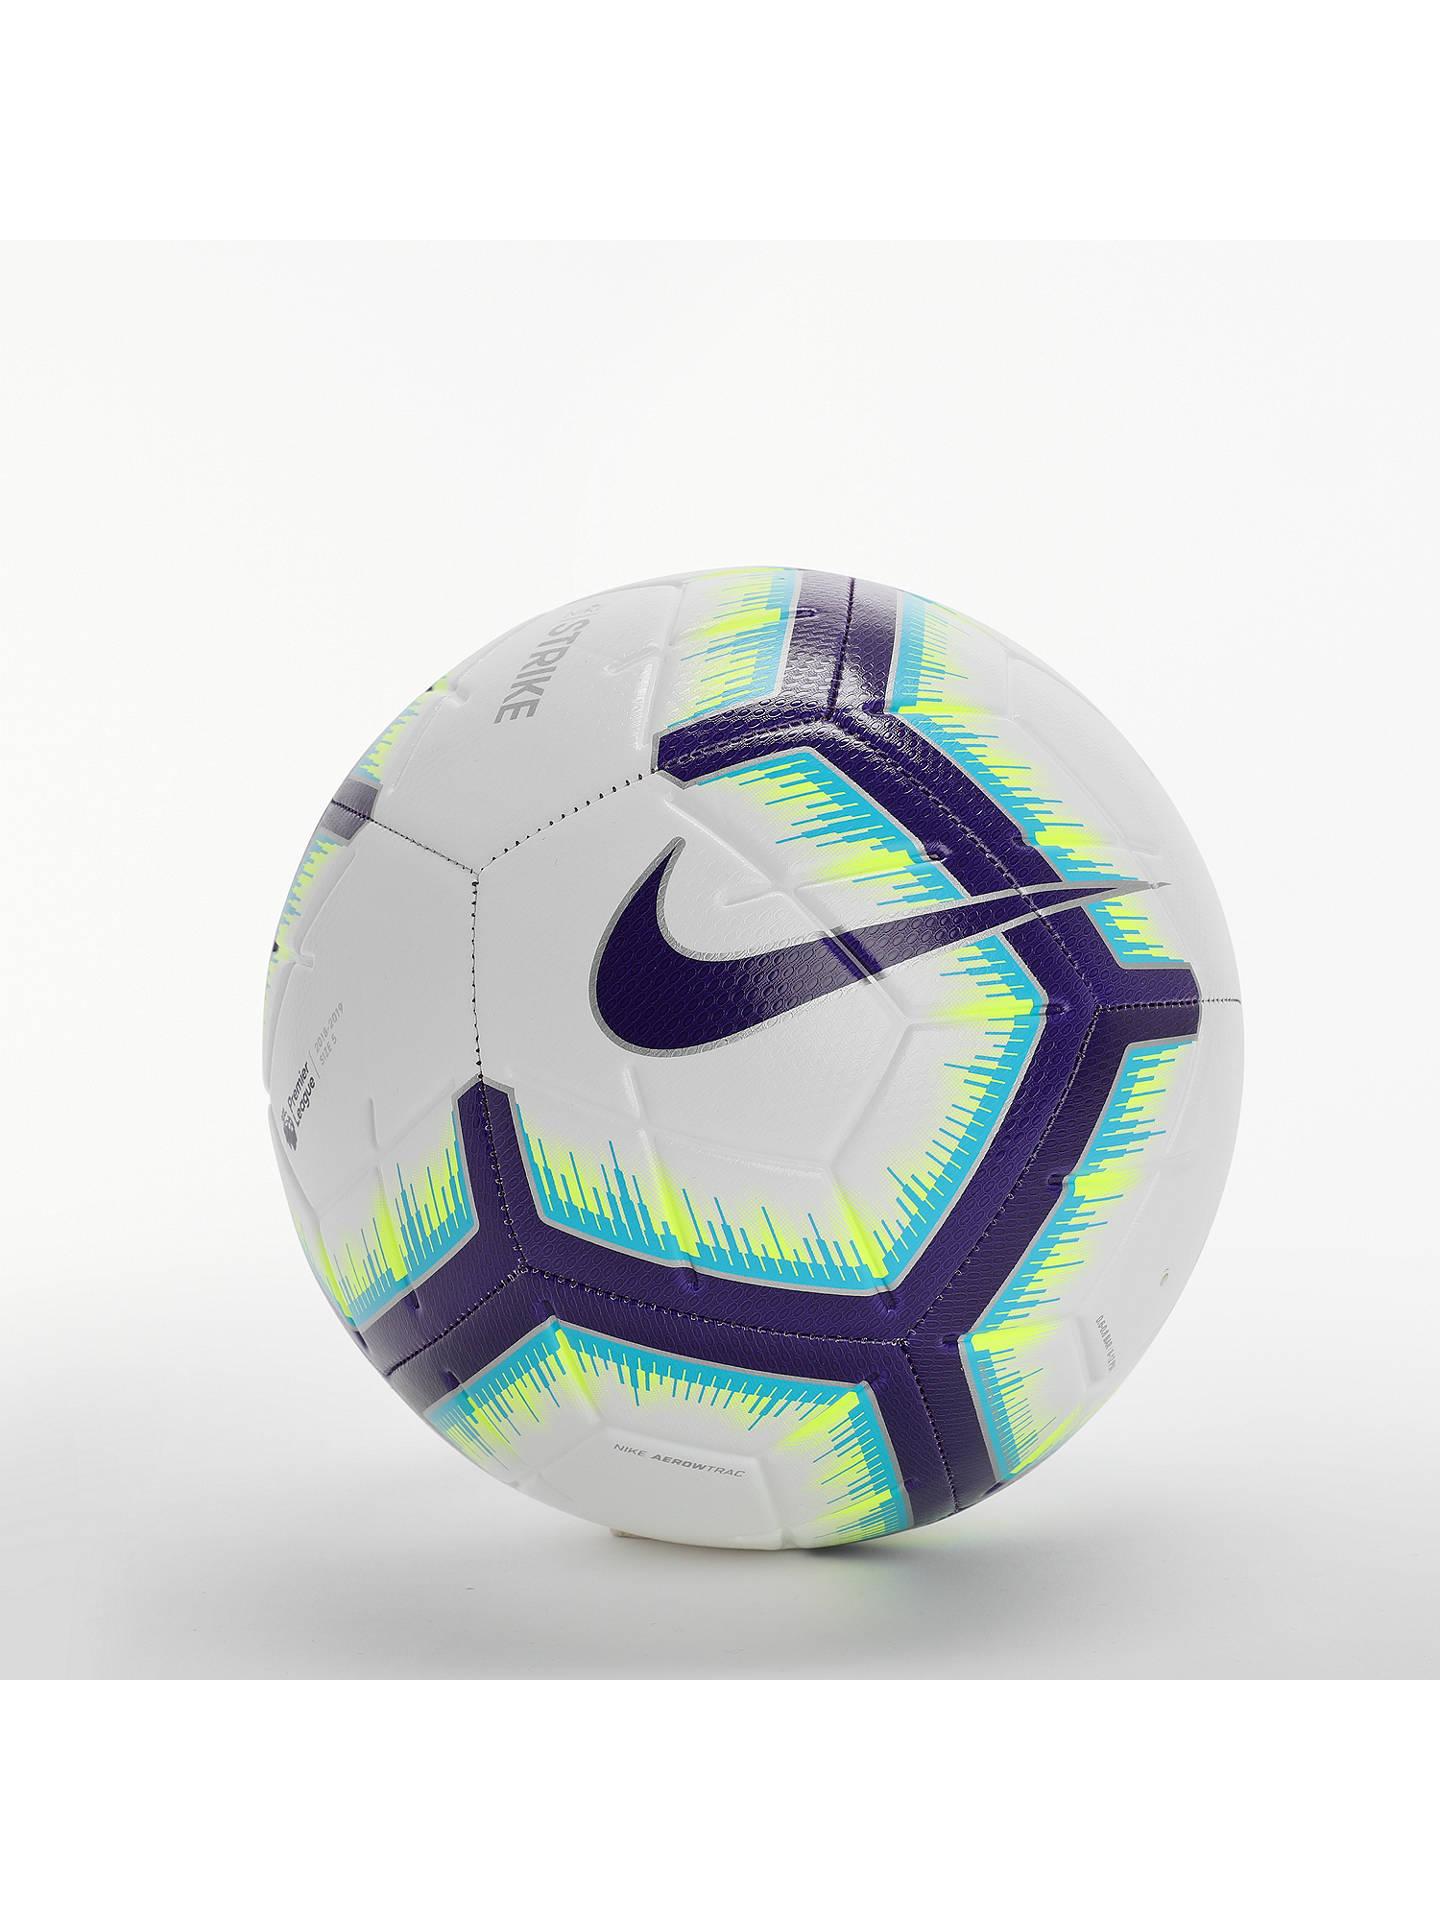 Nike 2018/2019 Premier League Strike Football, Size 5